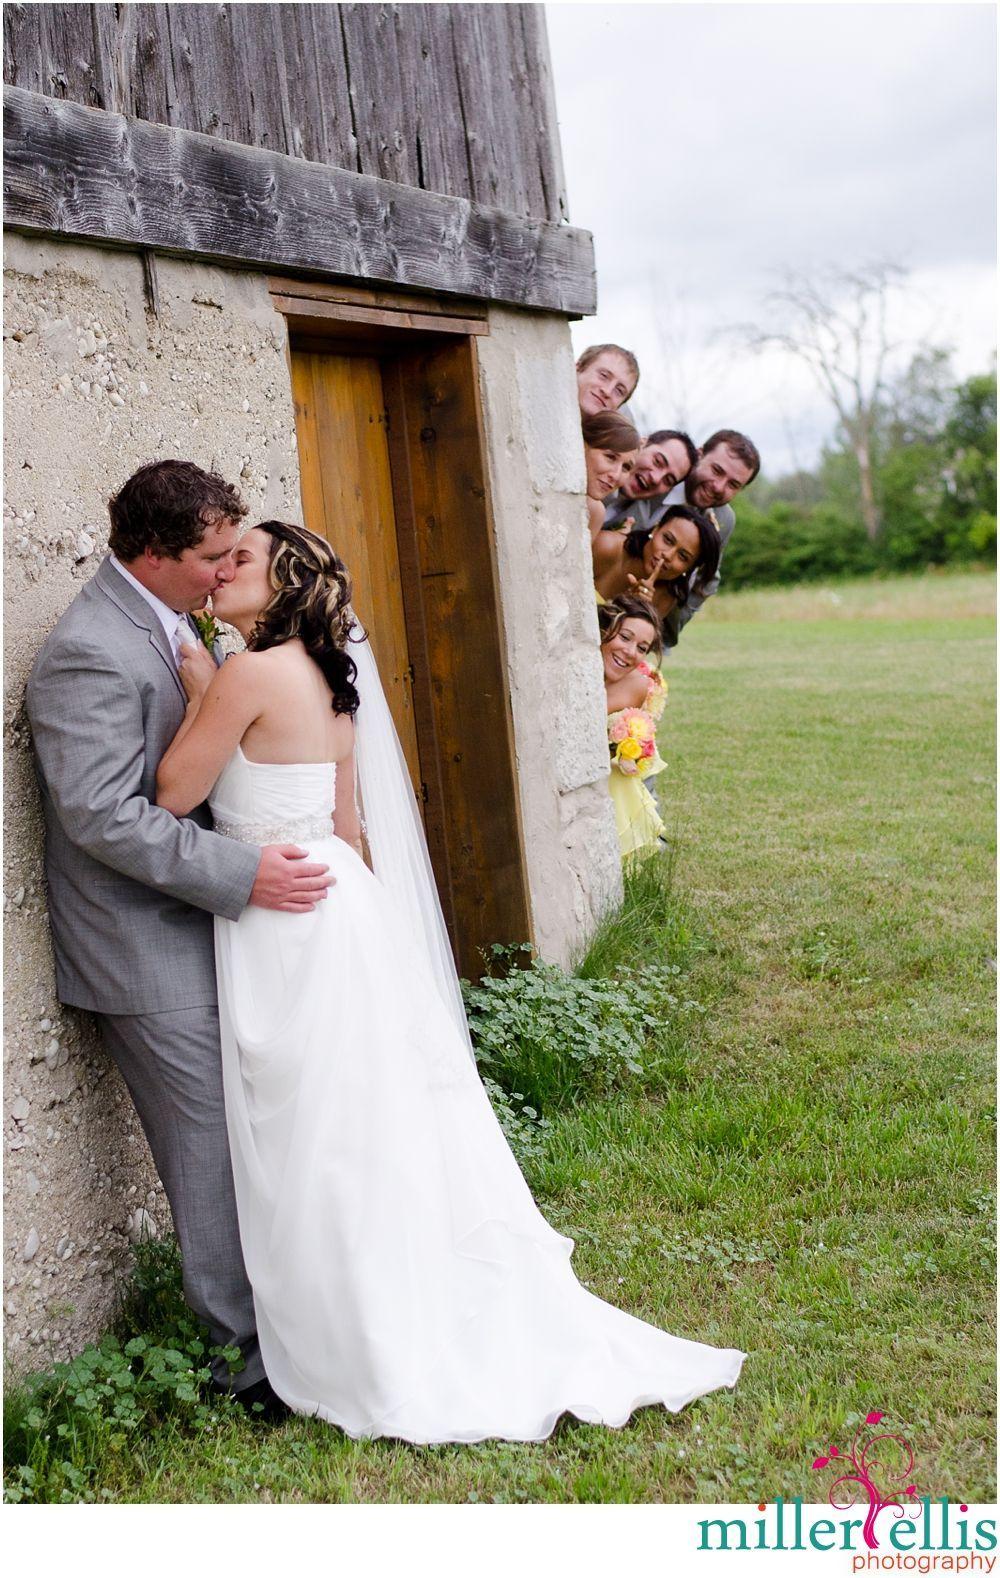 Funny Wedding Photography Best Photos Wedding Photography Cuteweddingideas Com Funny Wedding Photography Wedding Picture Poses Wedding Humor